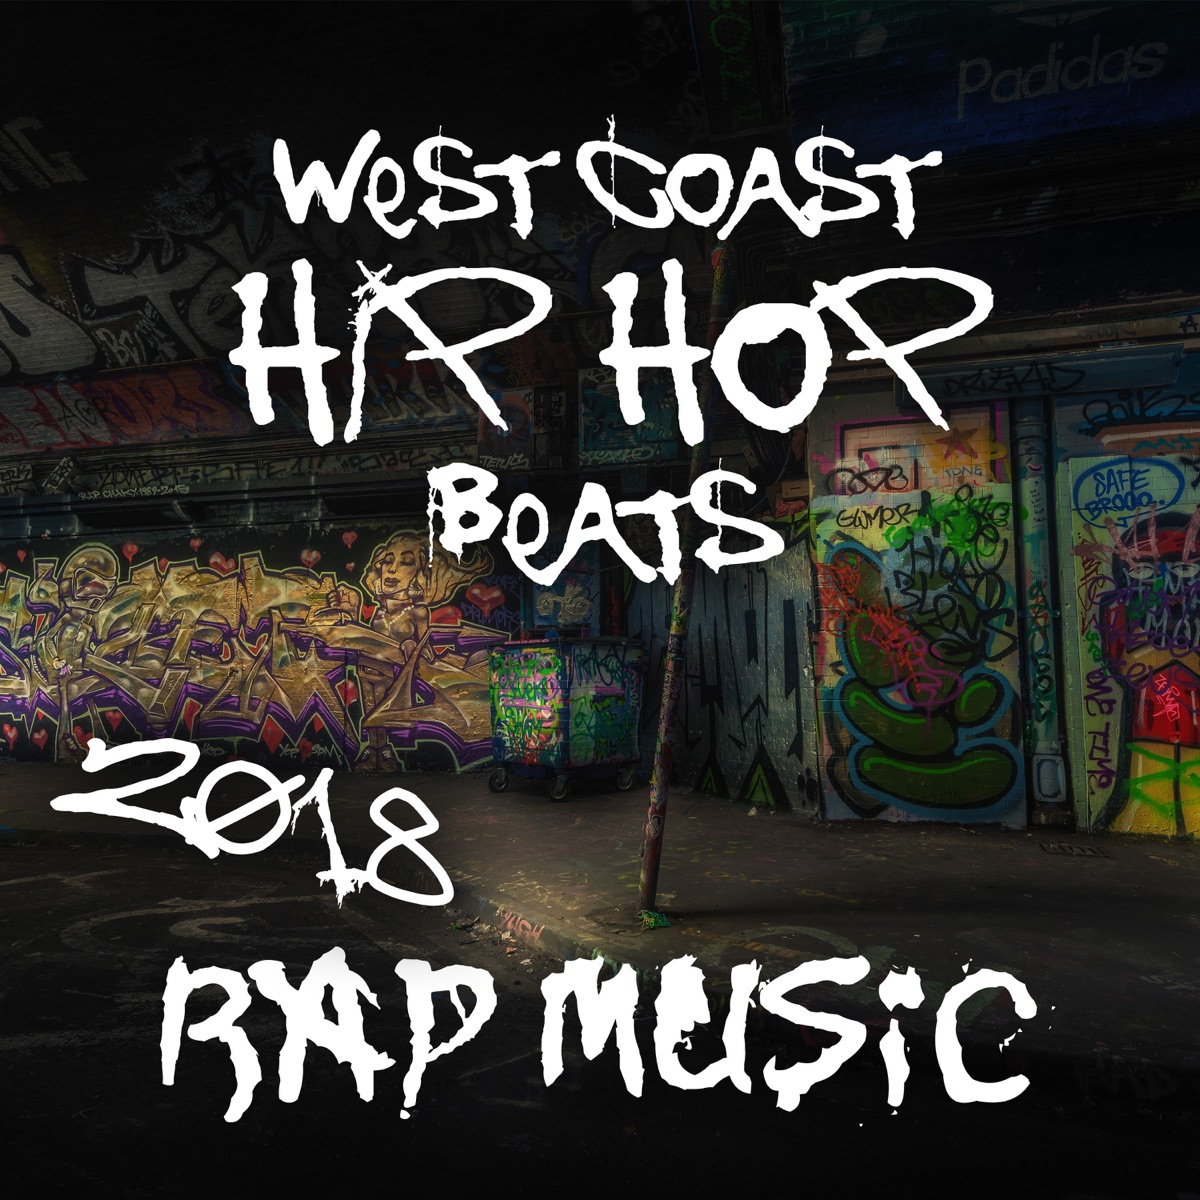 West Coast Hip Hop Beats: 2018 Rap Music, Freestyle Beats